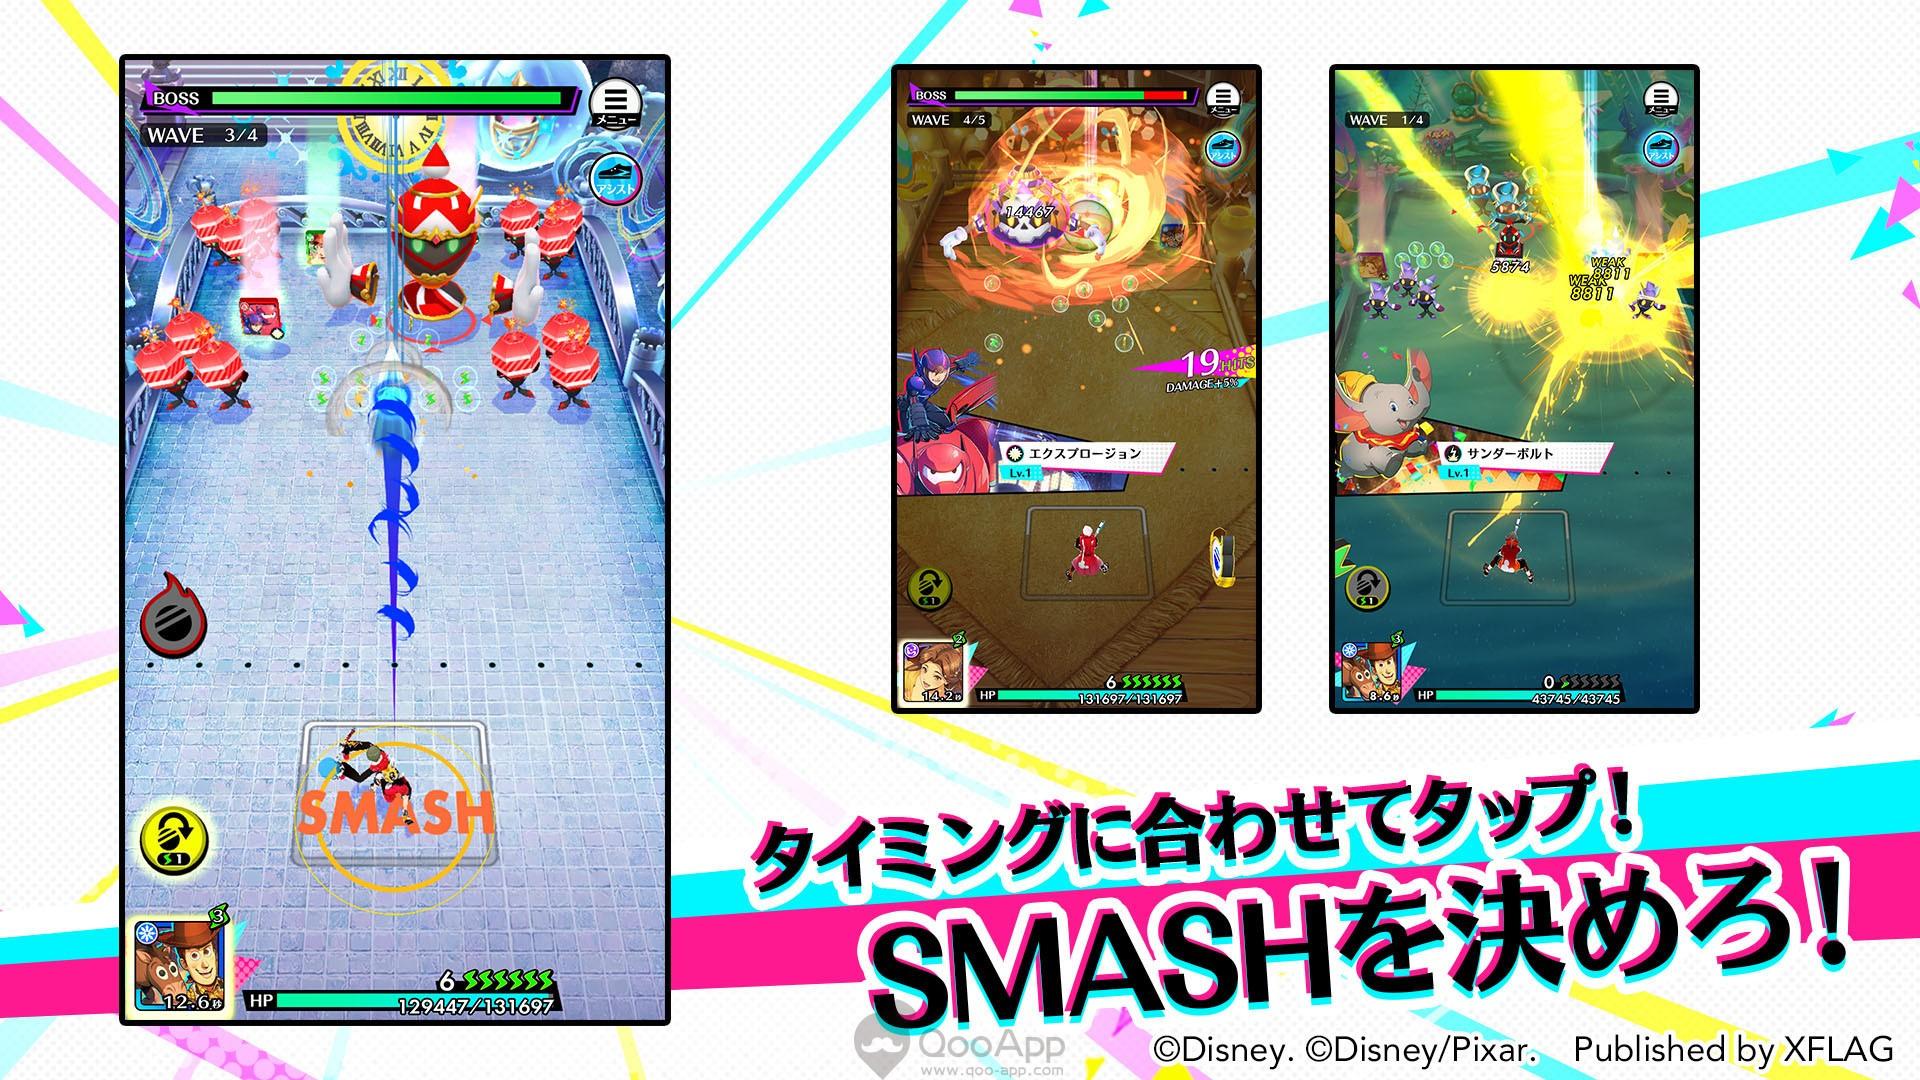 Mixi x Disney's Star Smash Mobile Game Shuts Down on December 7